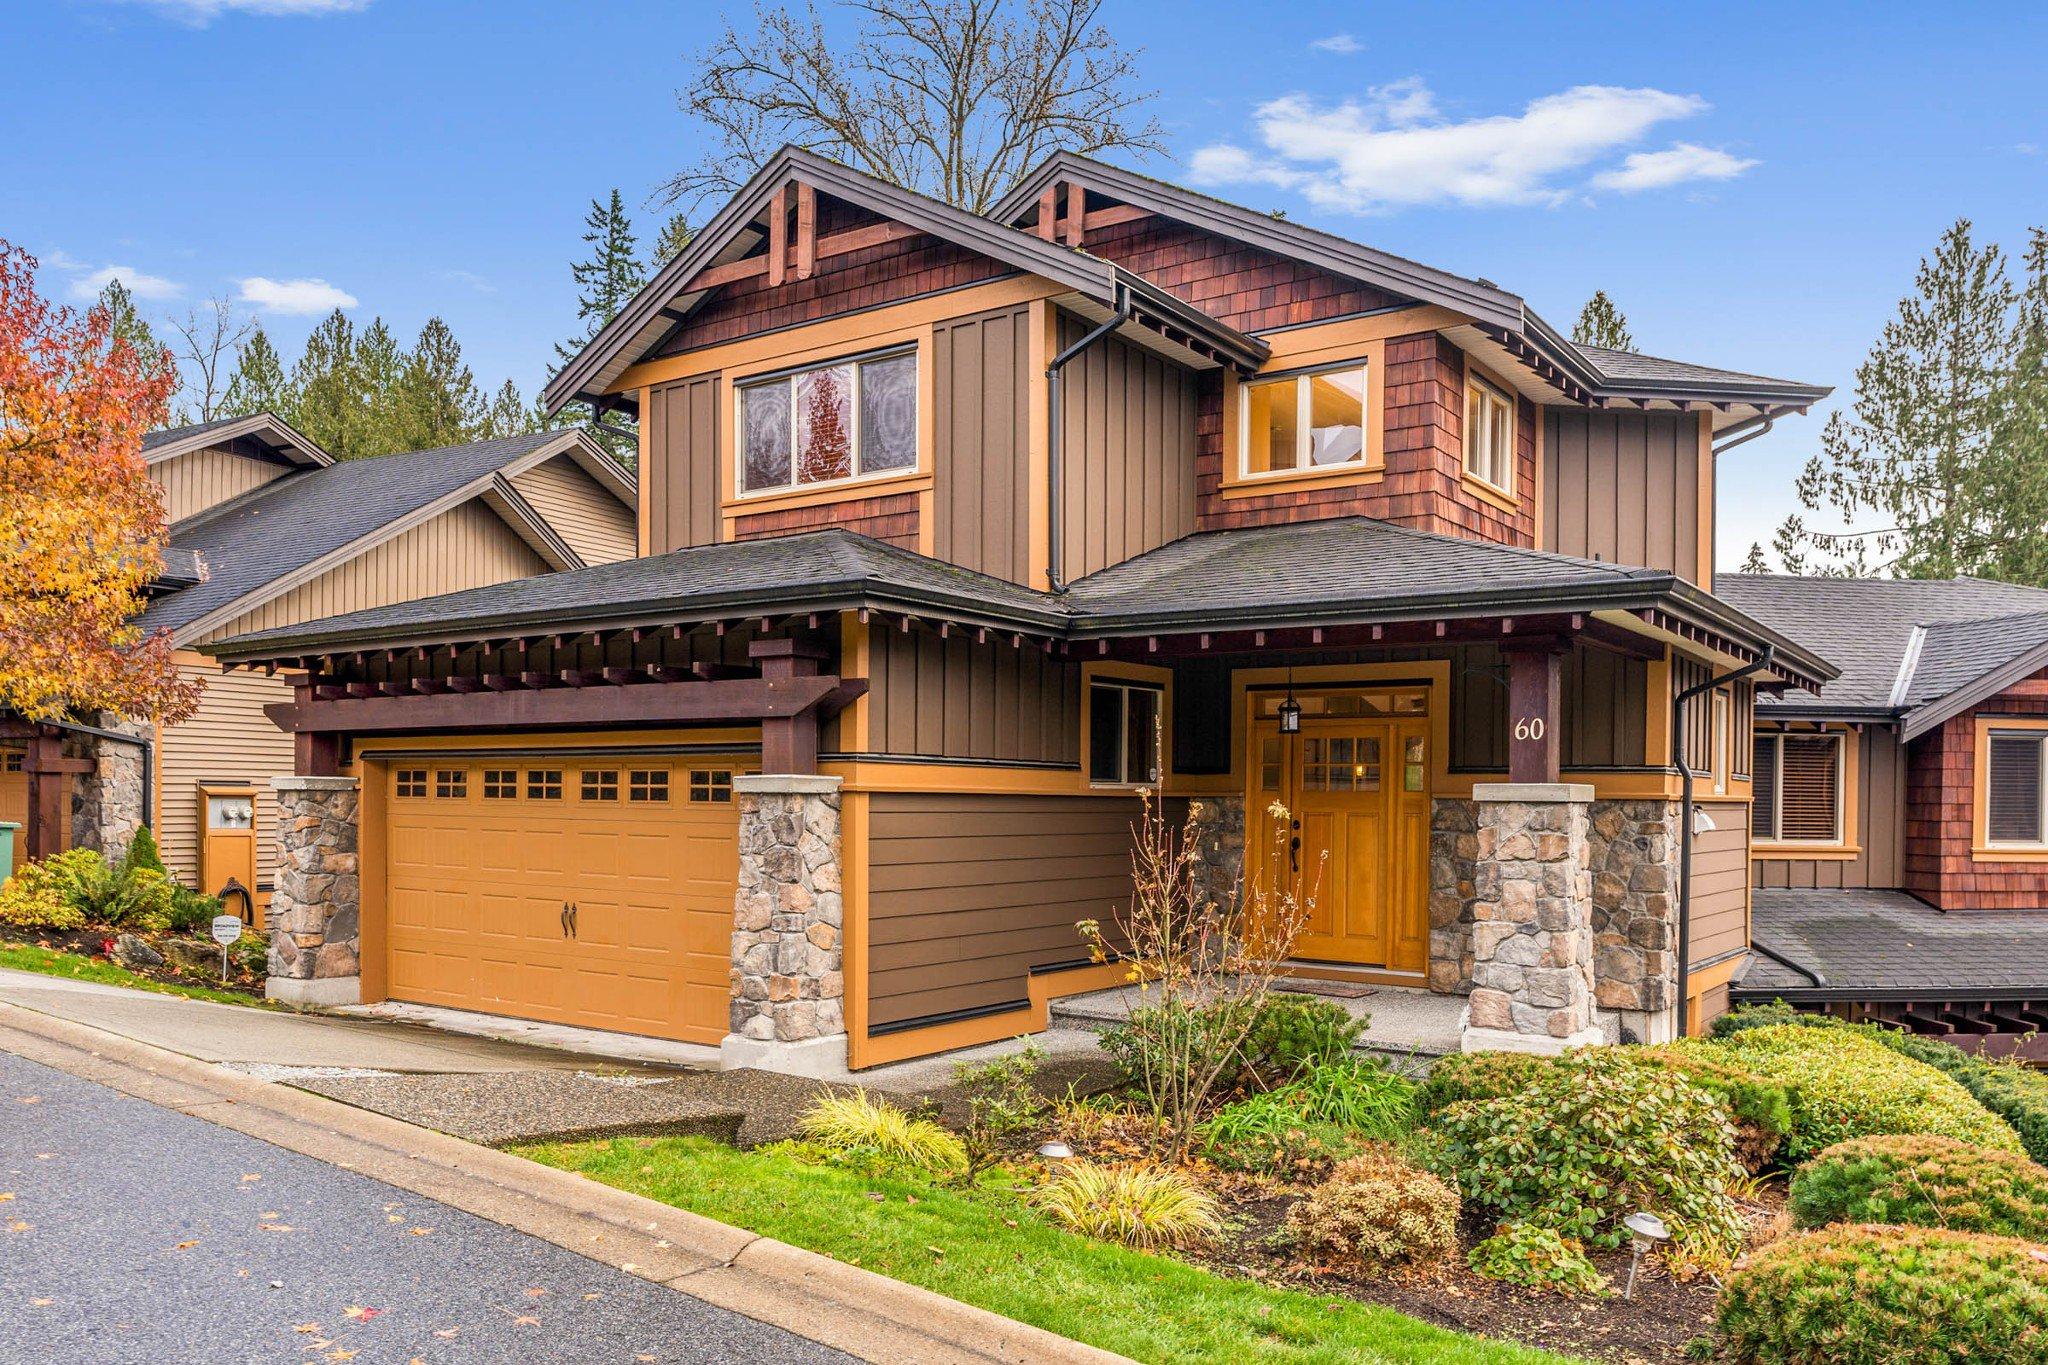 Main Photo: 60 24185 106B Avenue in Maple Ridge: Albion Townhouse for sale : MLS®# R2516435